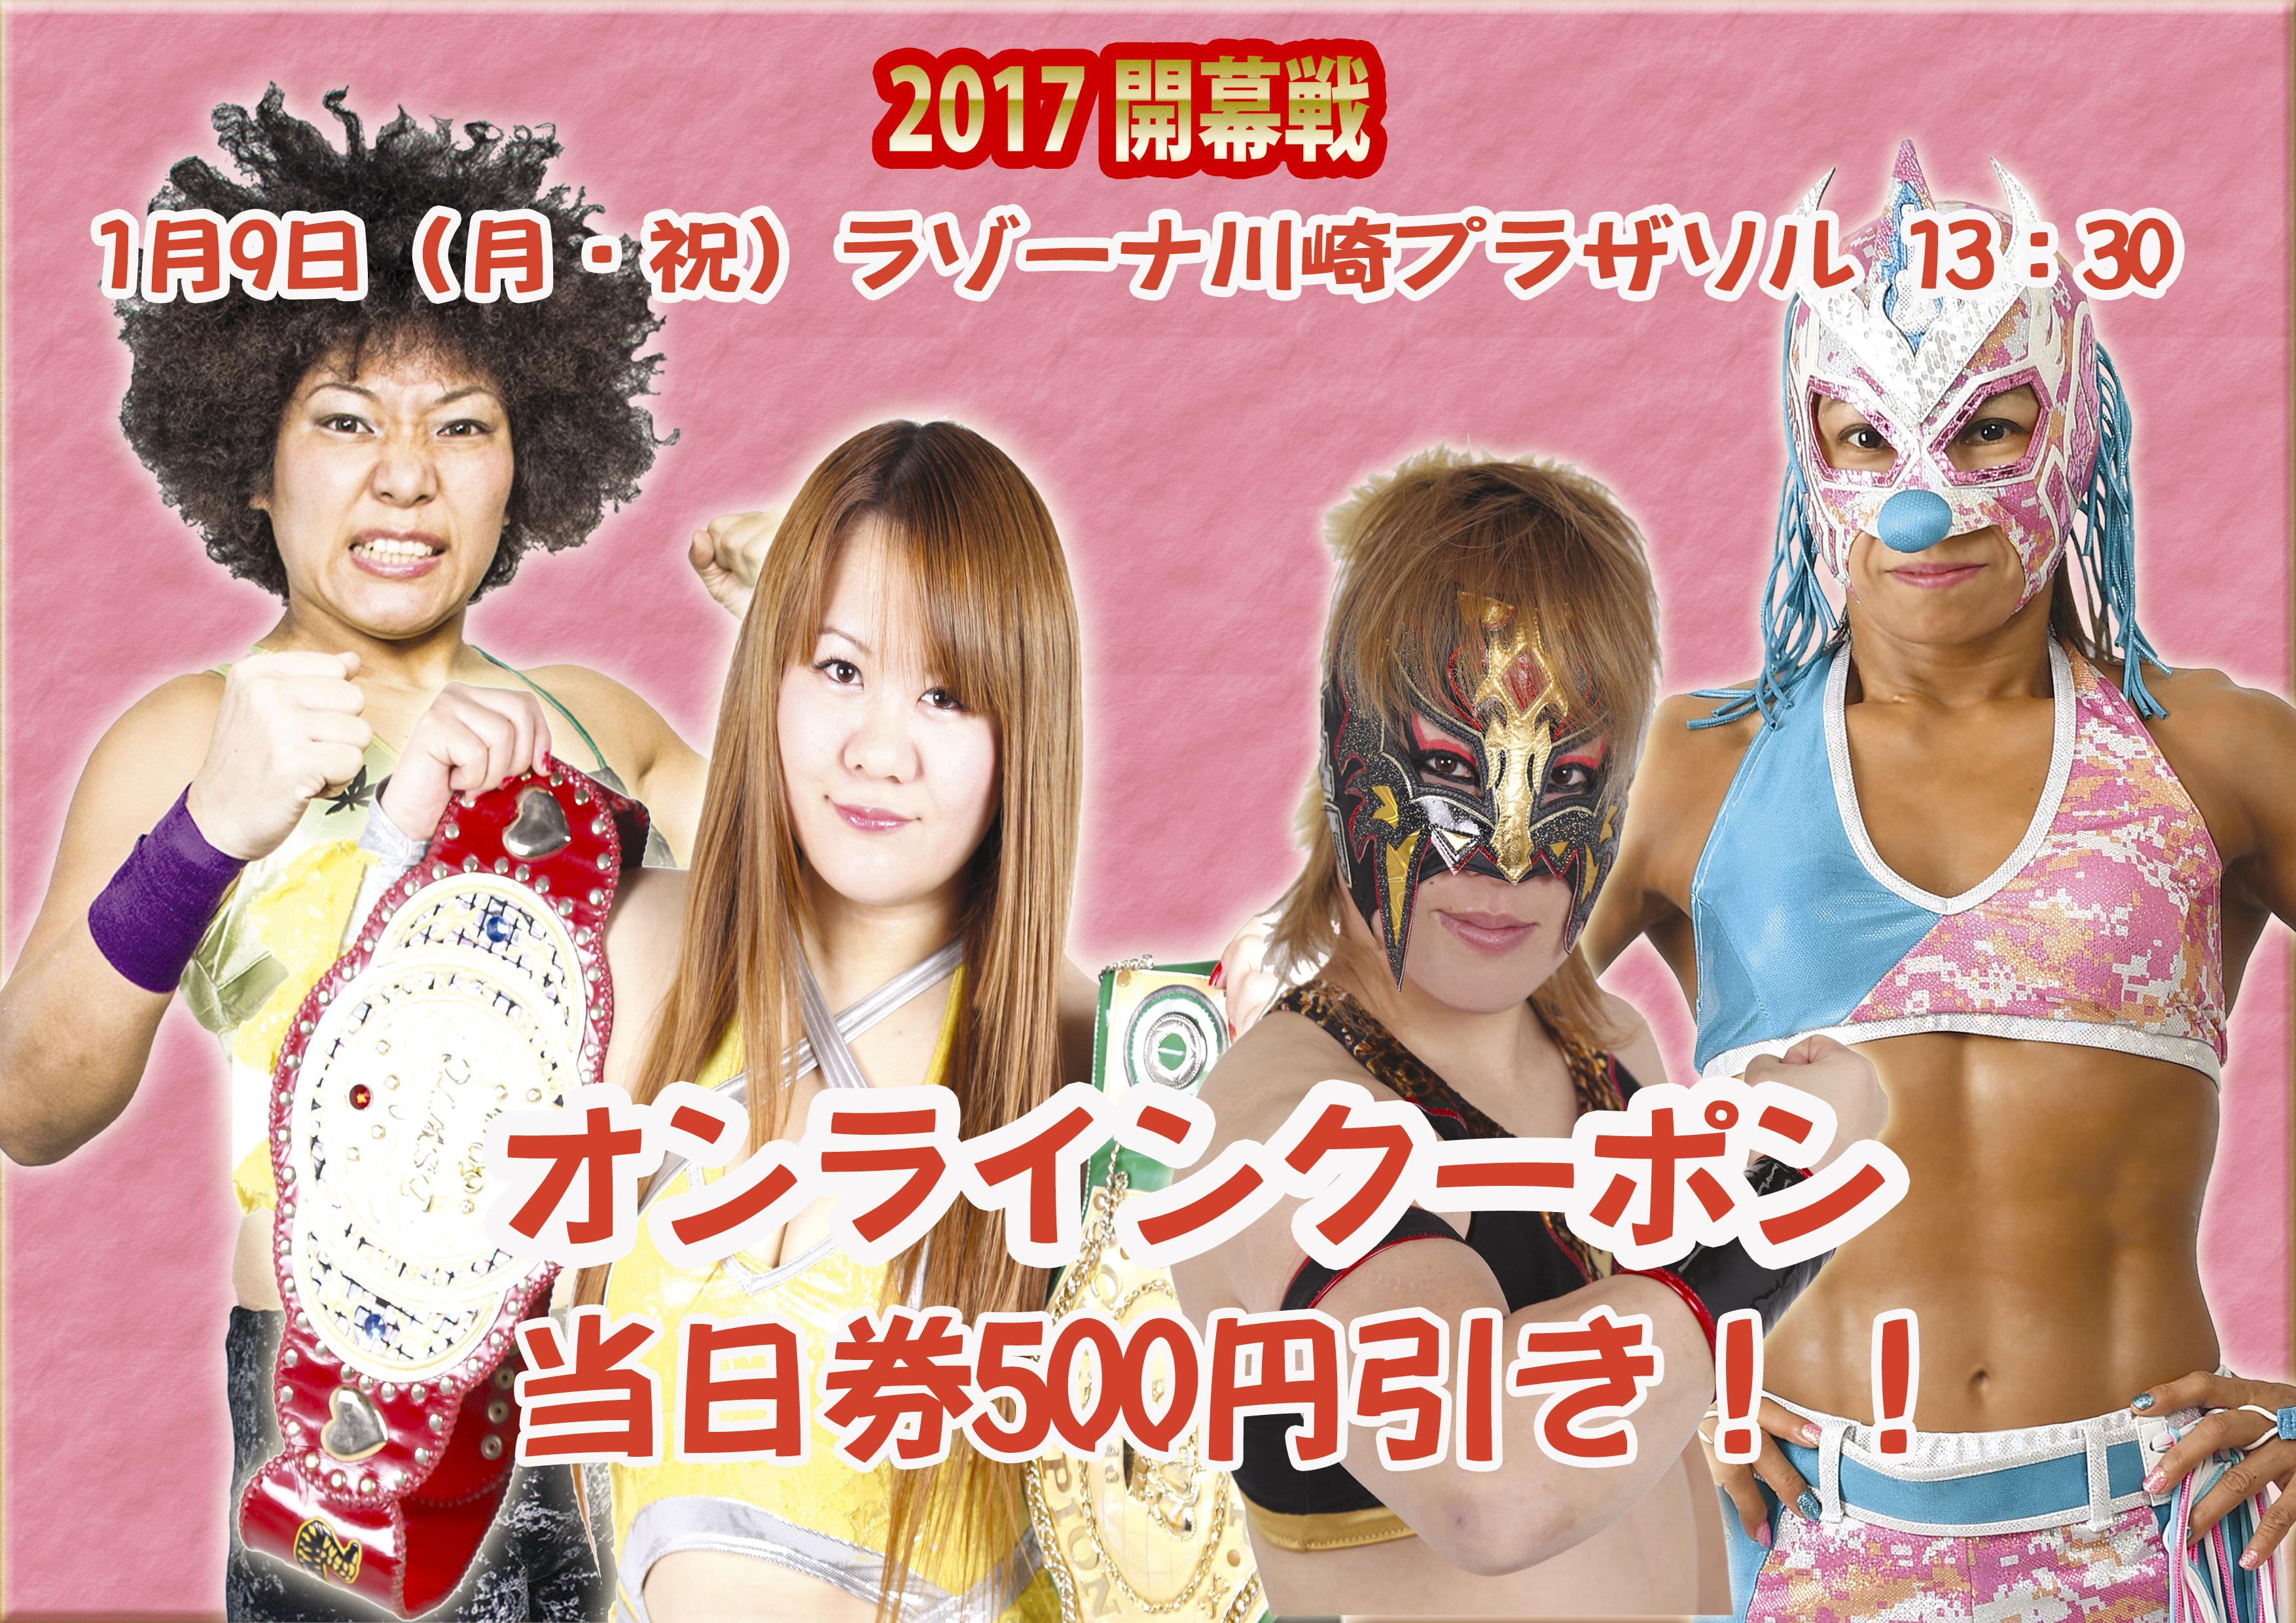 【JWP女子プロレス】1・9(月・祝)2017年開幕戦!大会直前情報・対戦カードみどころ公開!